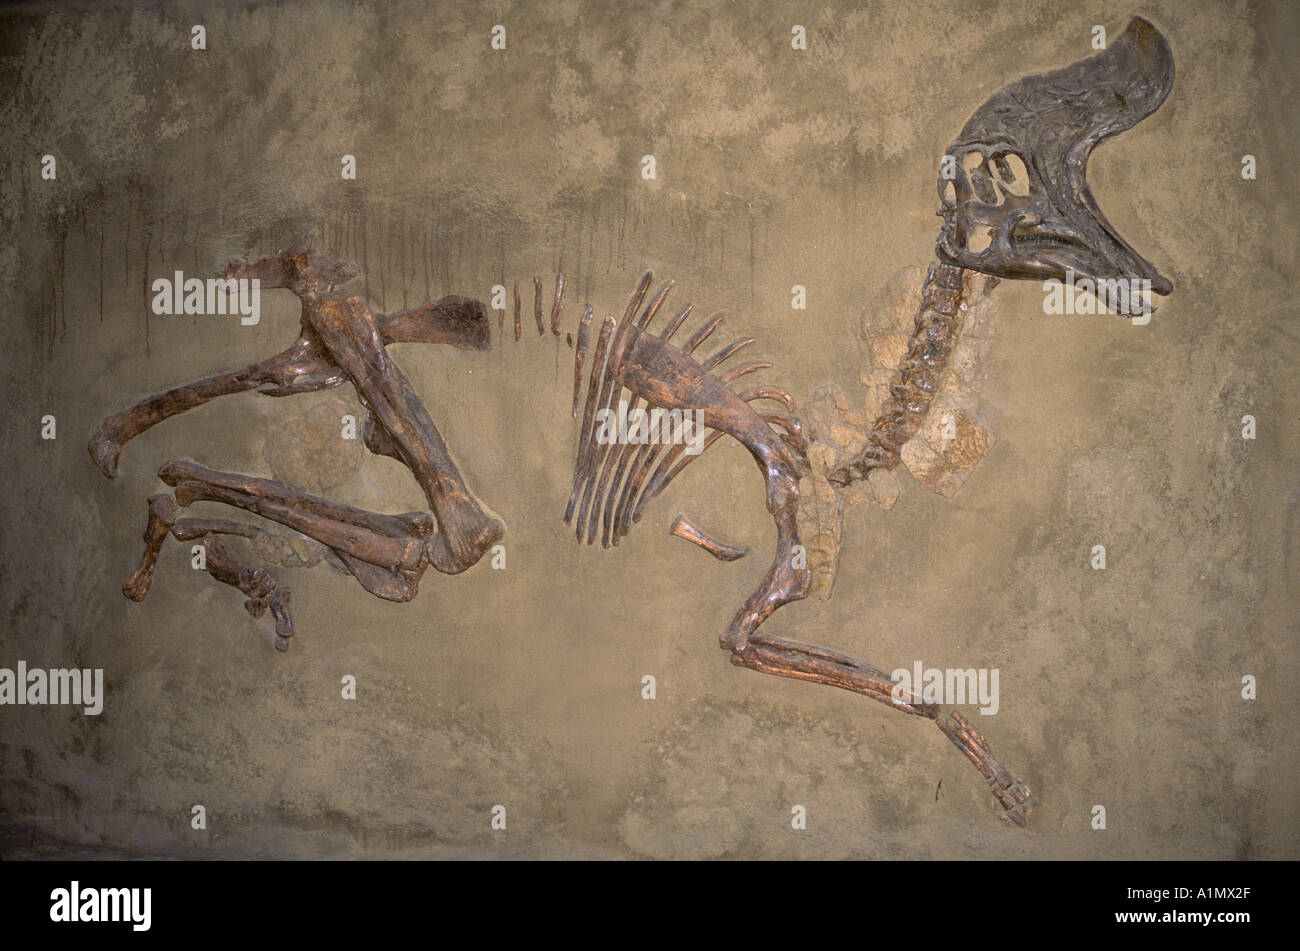 Dinosaur fossil of (Lambeosaurus cretaceous) Royal Tyrell Museum Drumheller Alberta Canada - Stock Image